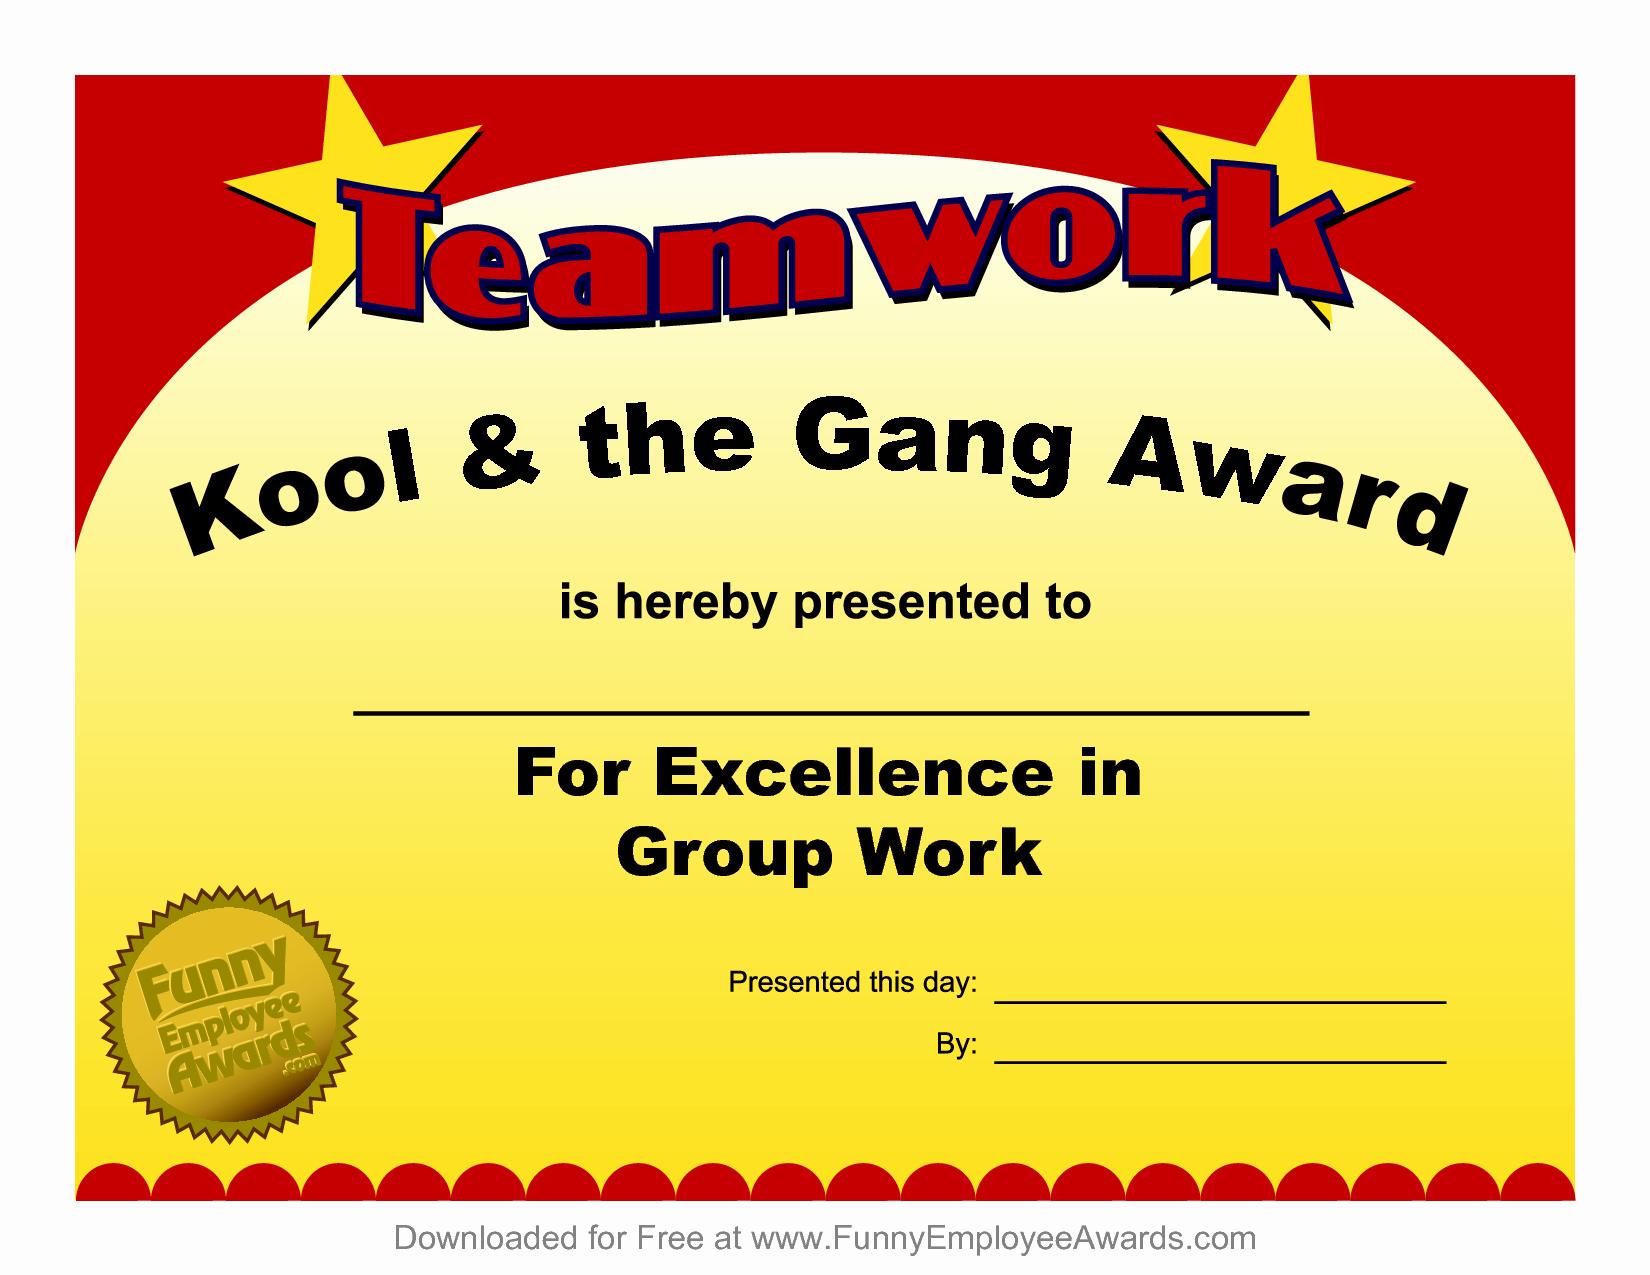 Award Certificate Template Free Inspirational Fun Award Templatefree Employee Award Certificate